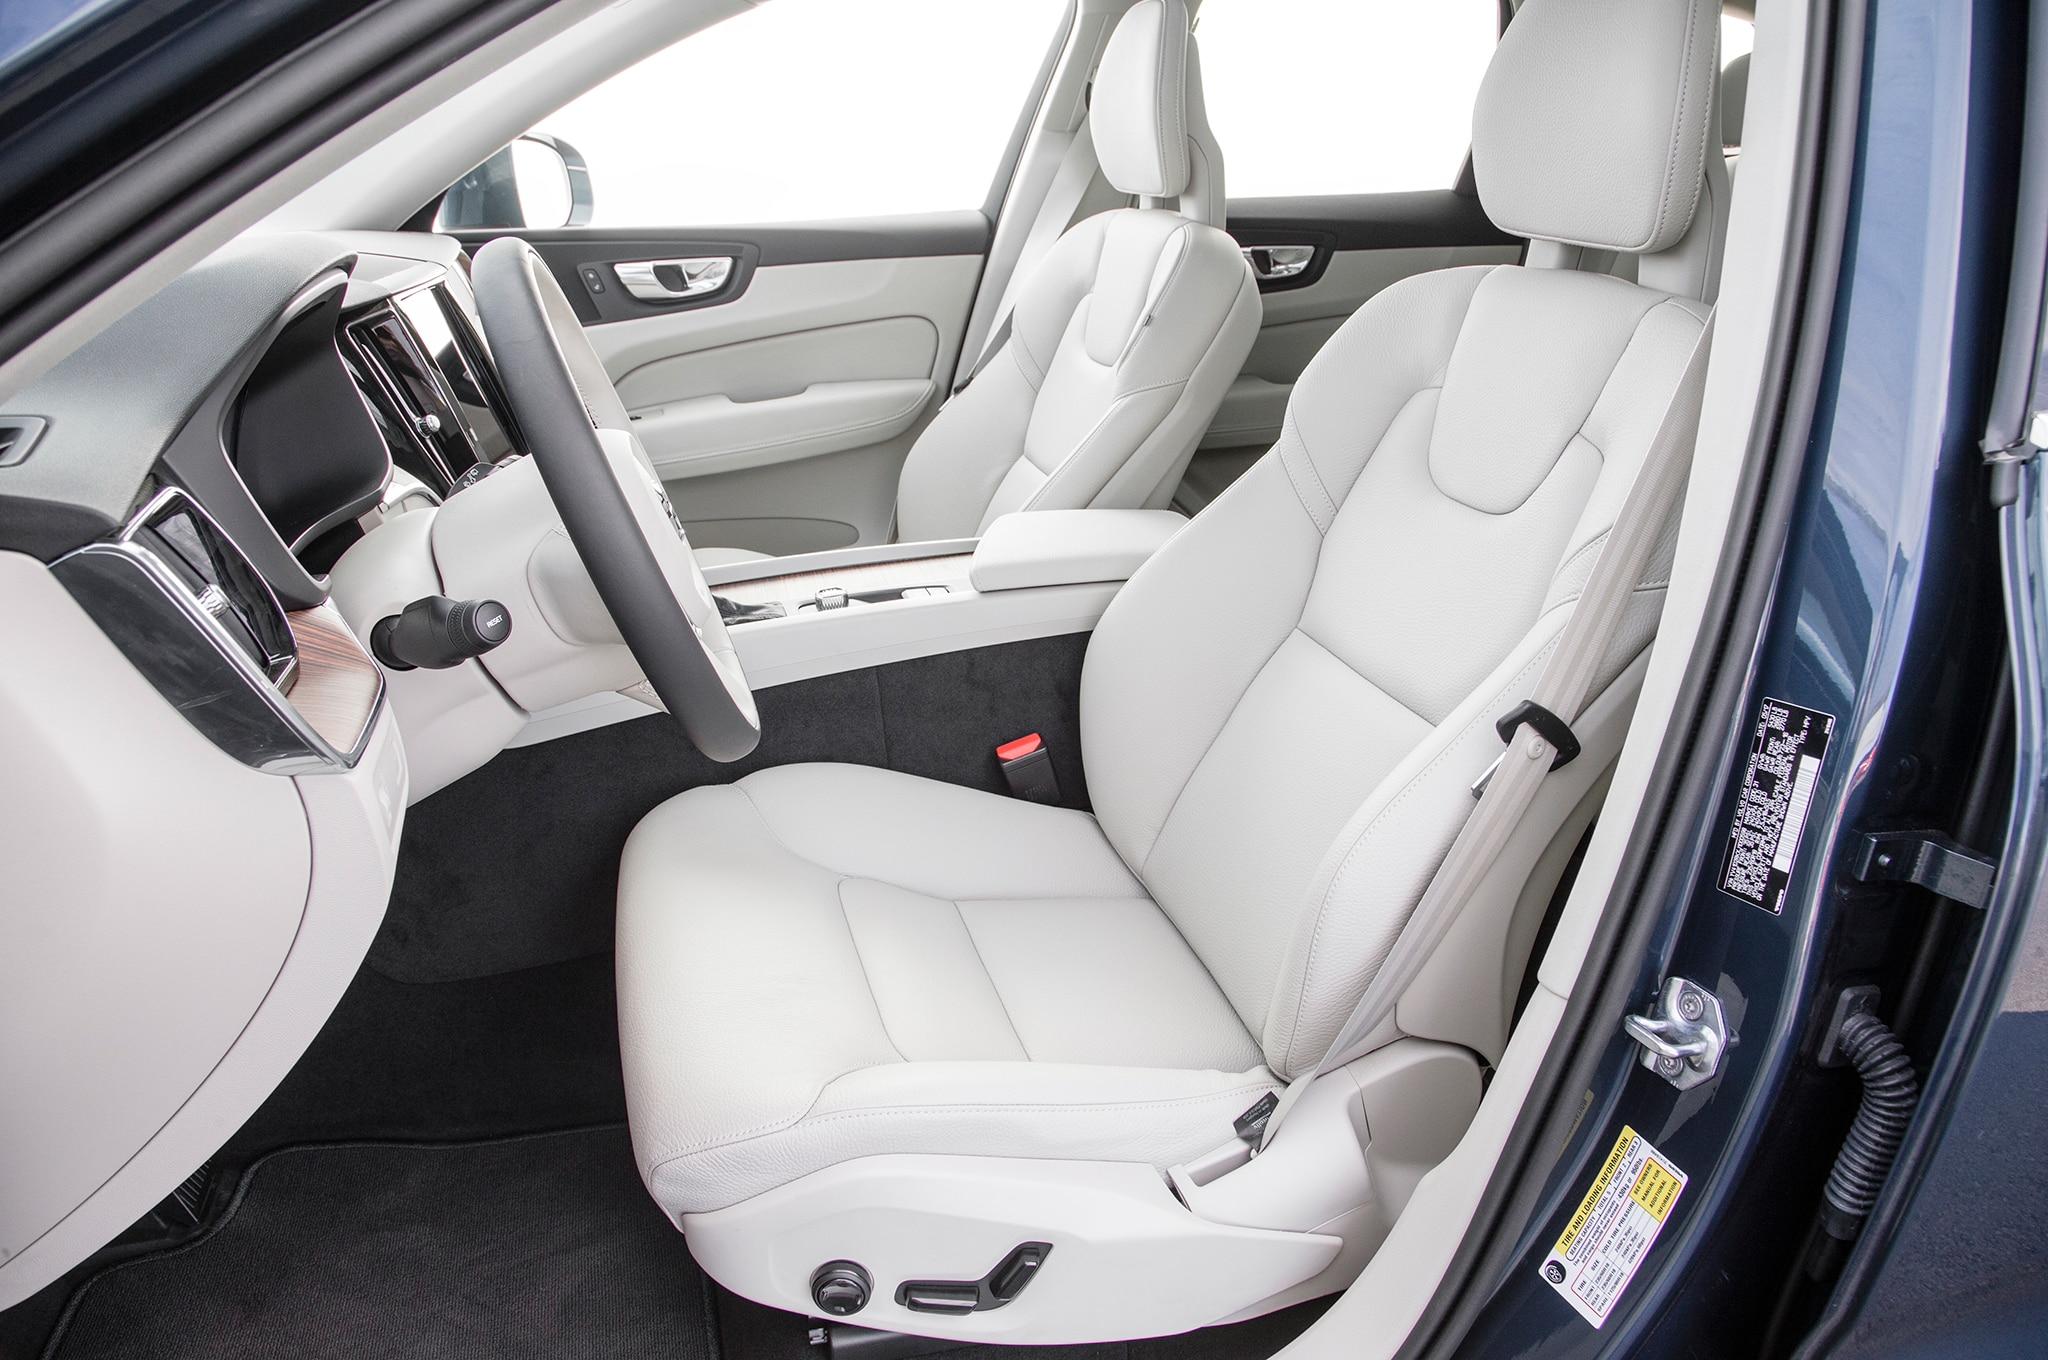 2017 Dodge Durango Gt >> 2018 Volvo XC60 T5 Momentum front interior seats - Motor ...